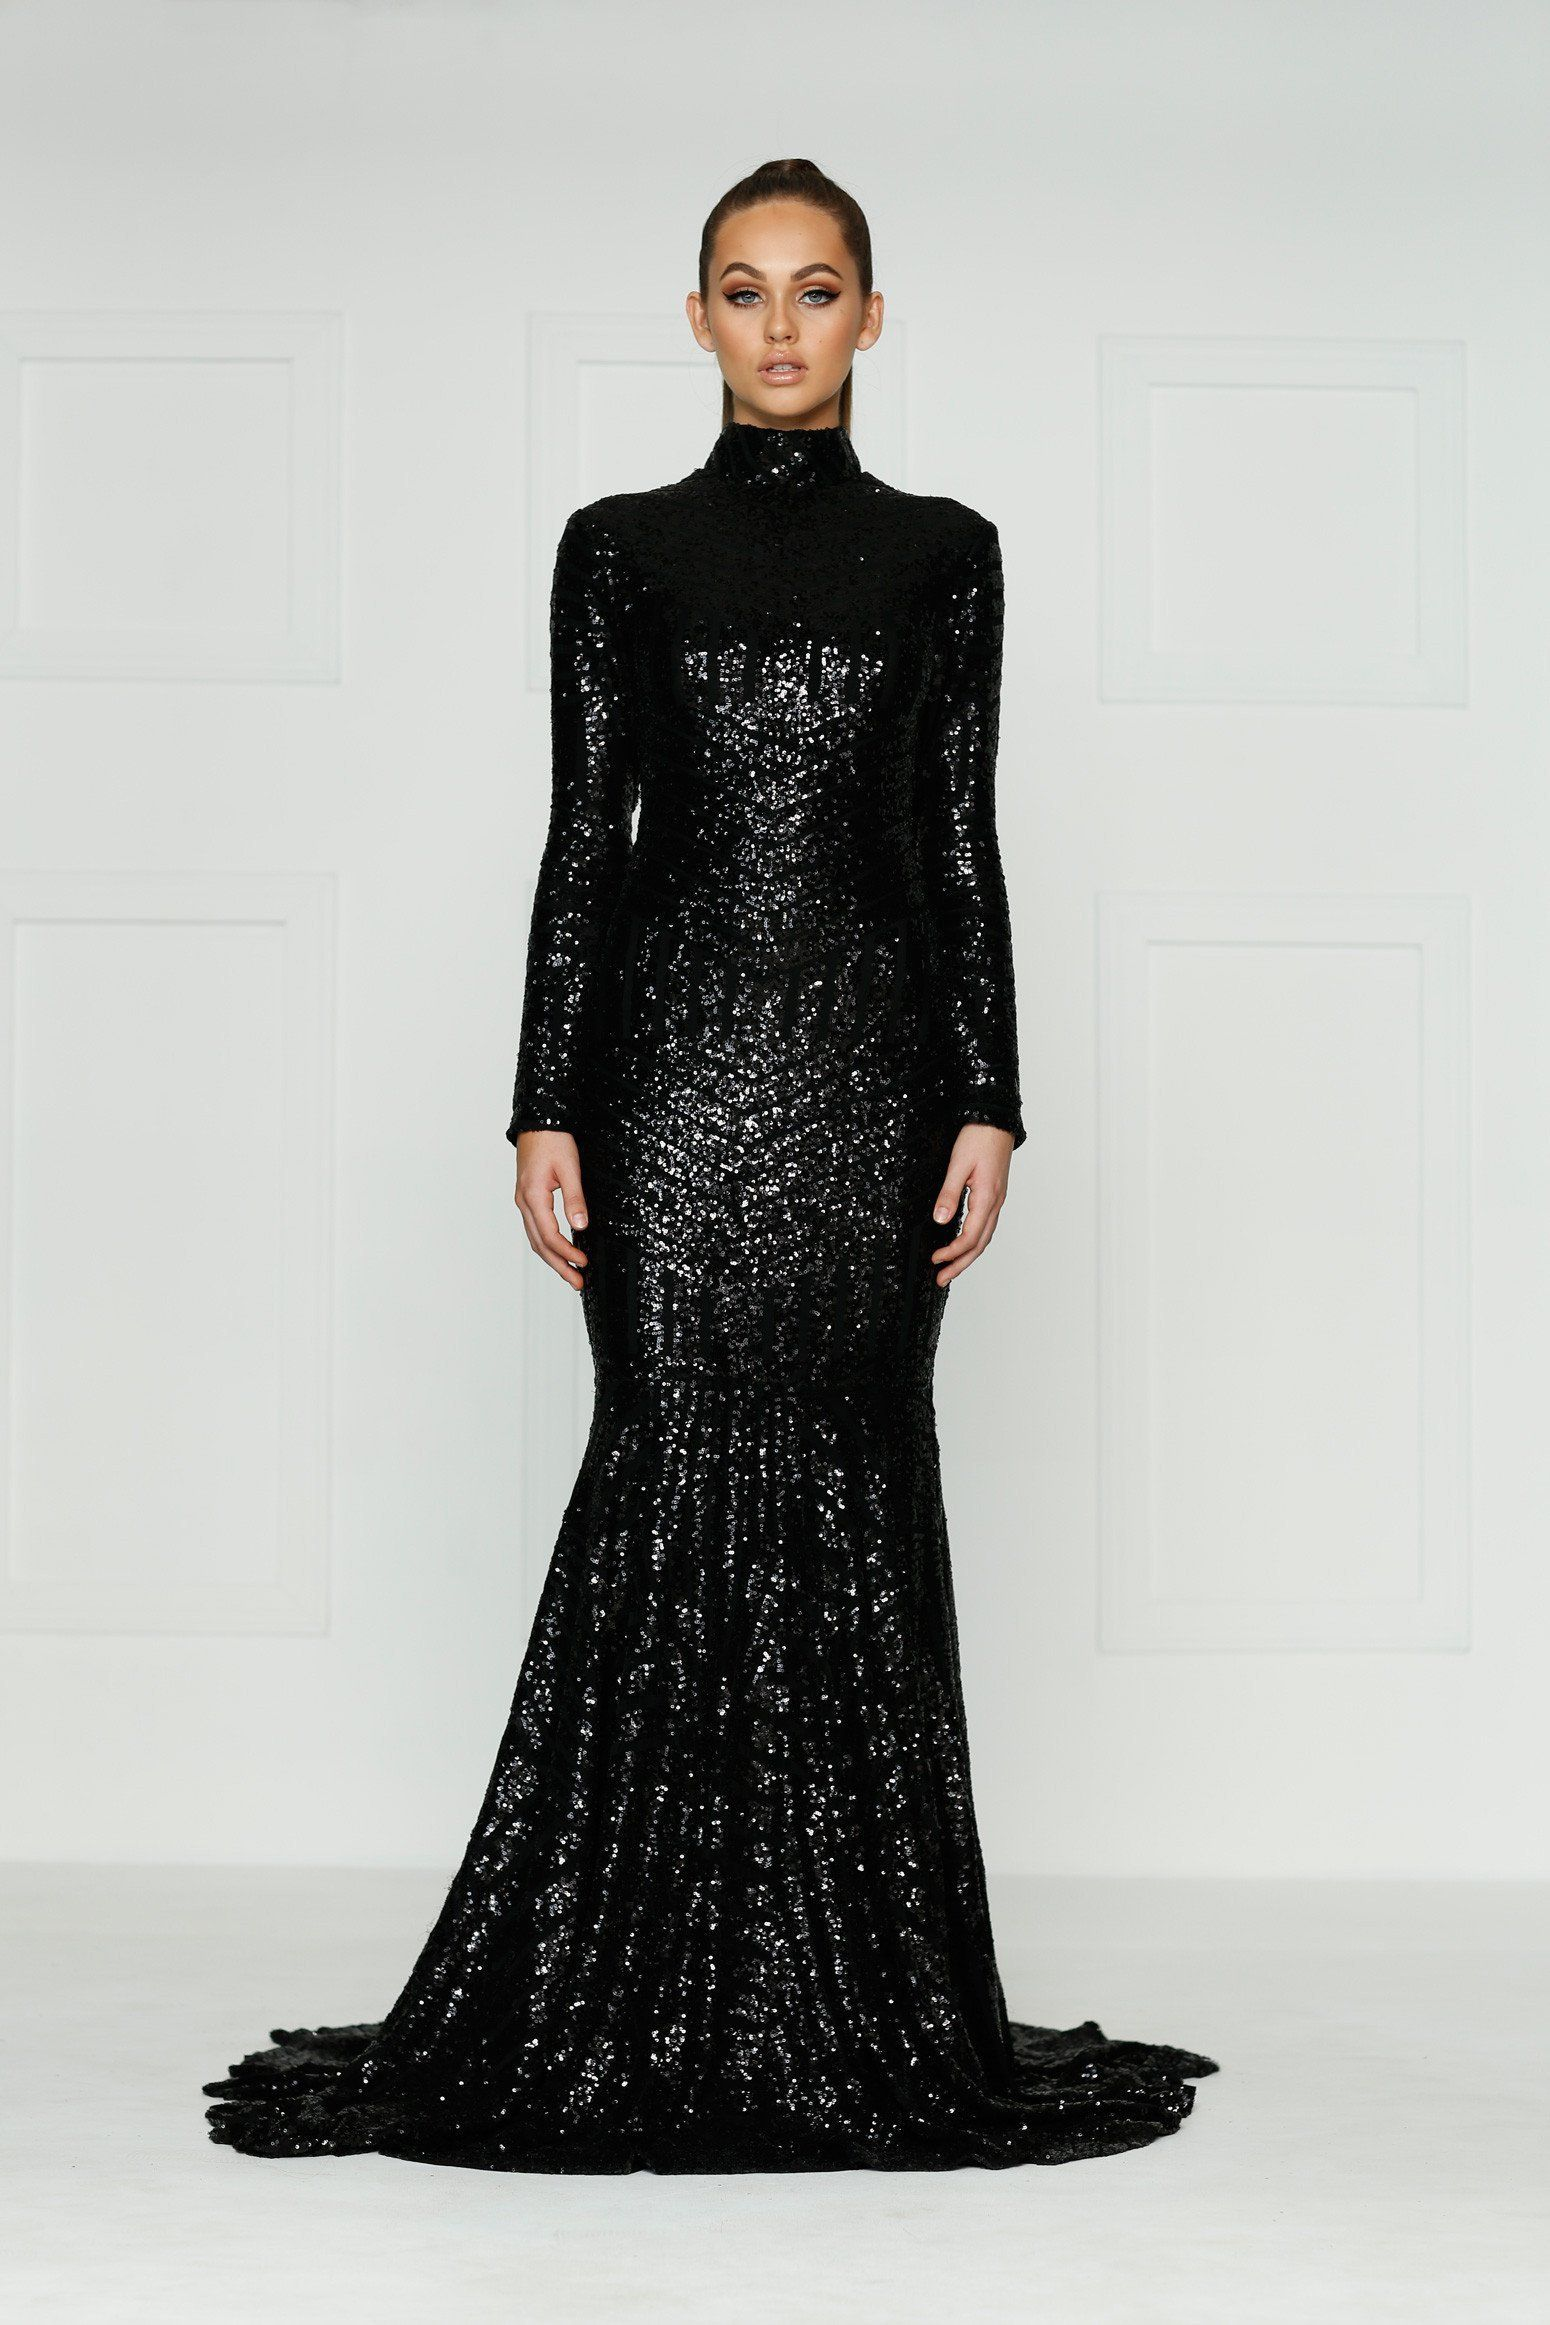 dcc484a1e60 Long Sleeve Black Sequin Prom Dress - Data Dynamic AG